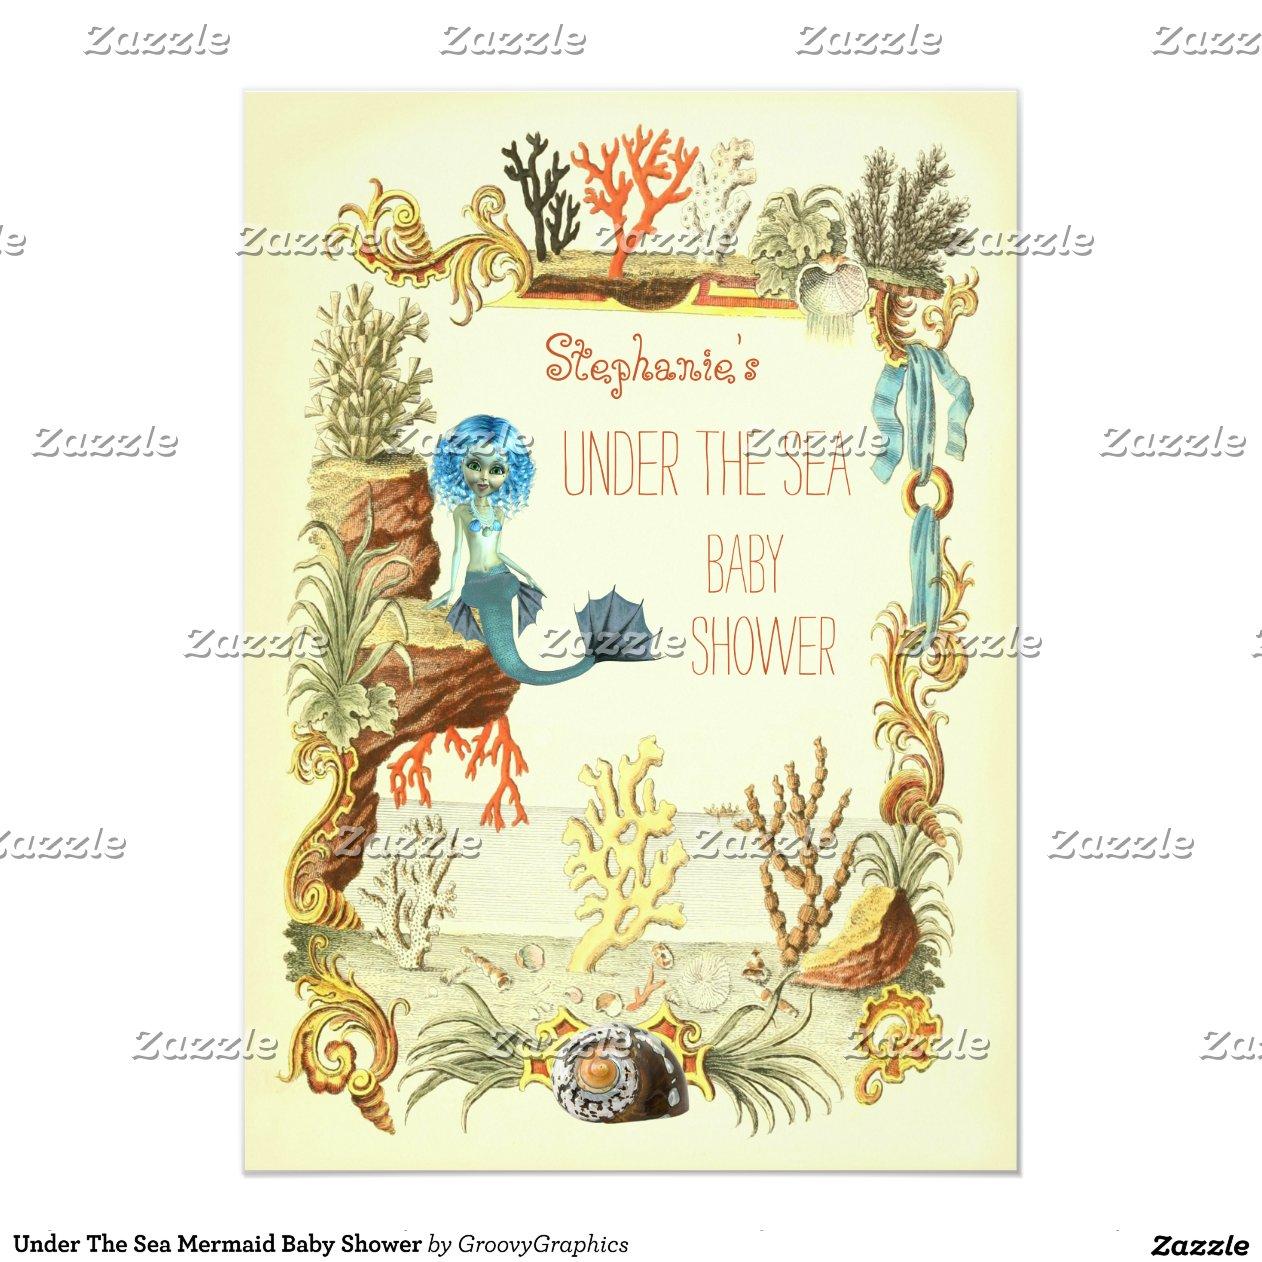 Mermaid Baby Shower Invitation as perfect invitations design